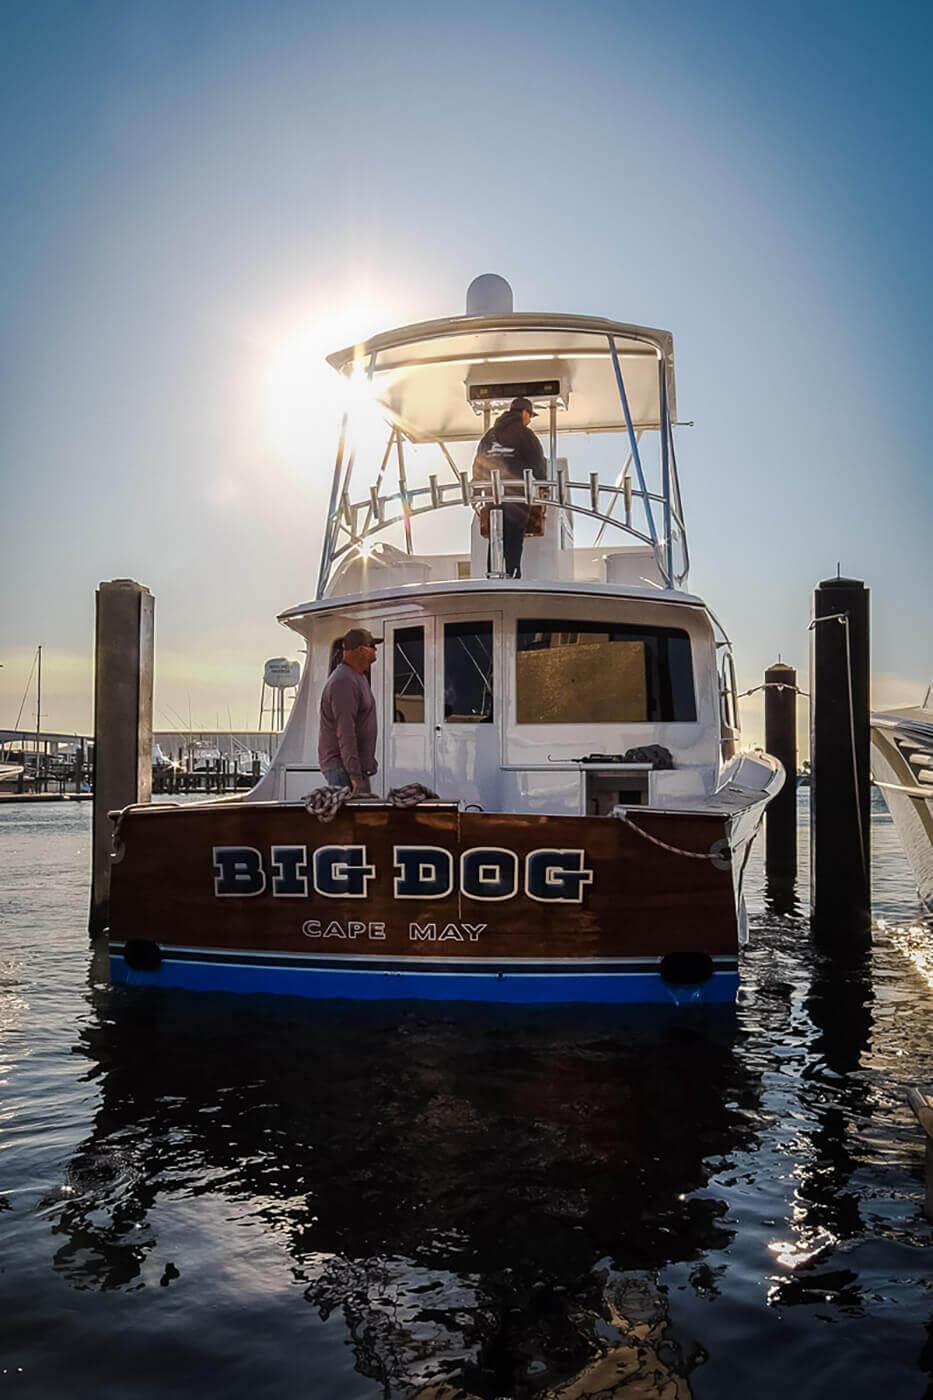 Big Dog Cape May Boat Transom